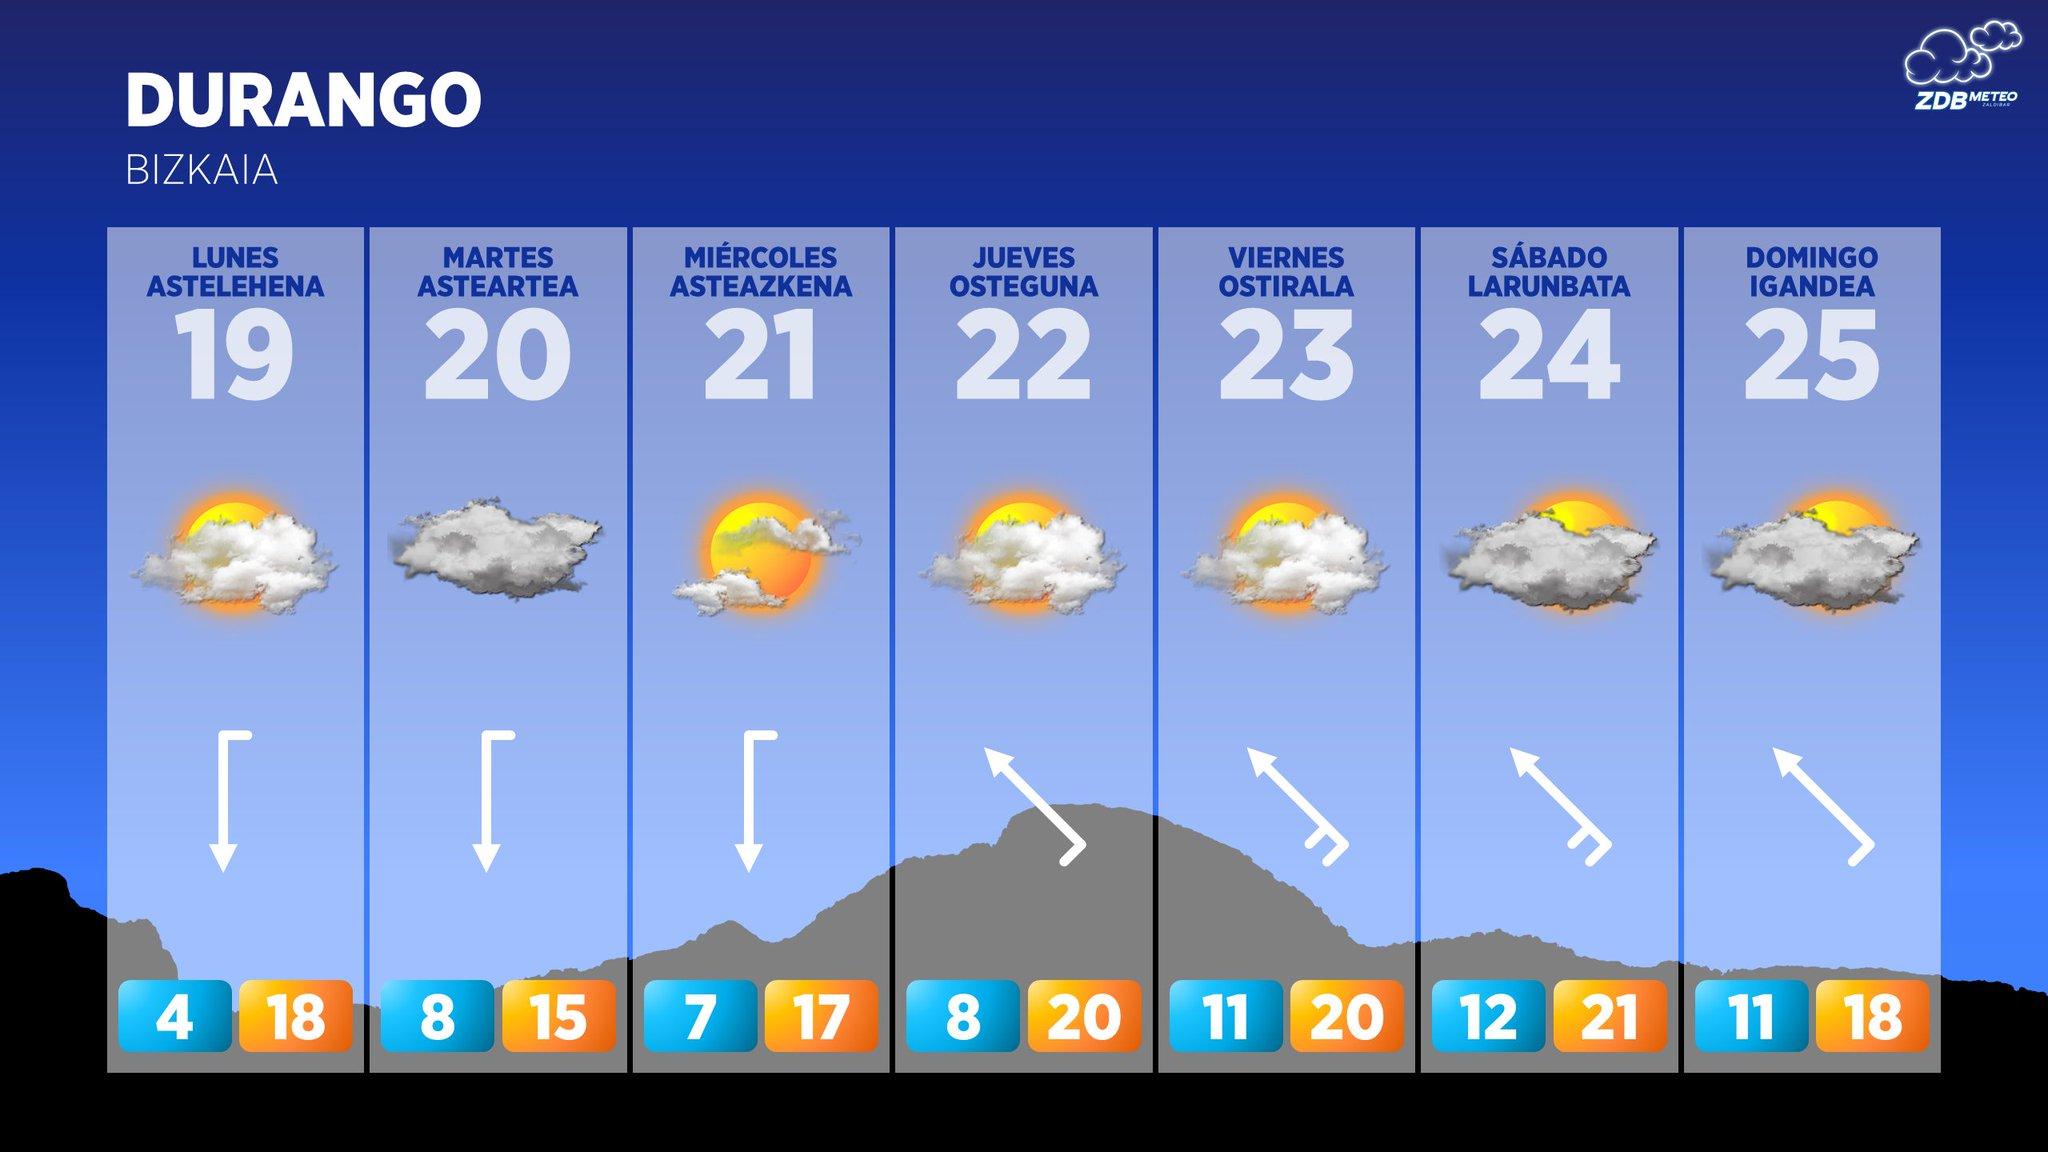 [dotb.eus] Semana con intervalos nubosos y poca lluvia